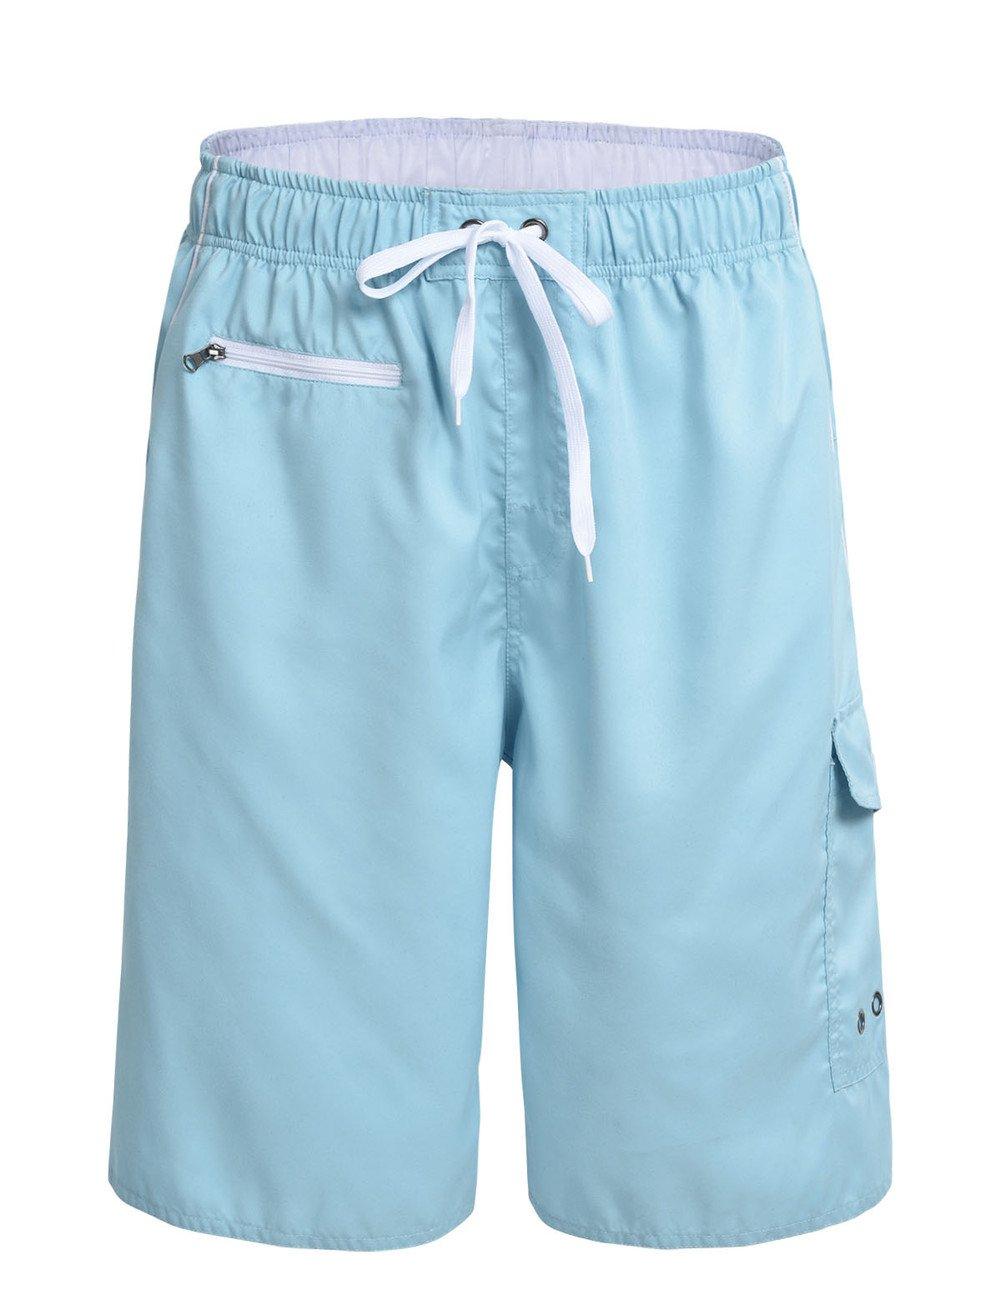 Nonwe Men's Beachwear Swim Trunks Quick Dry Zipper Pockets Lining JF16135